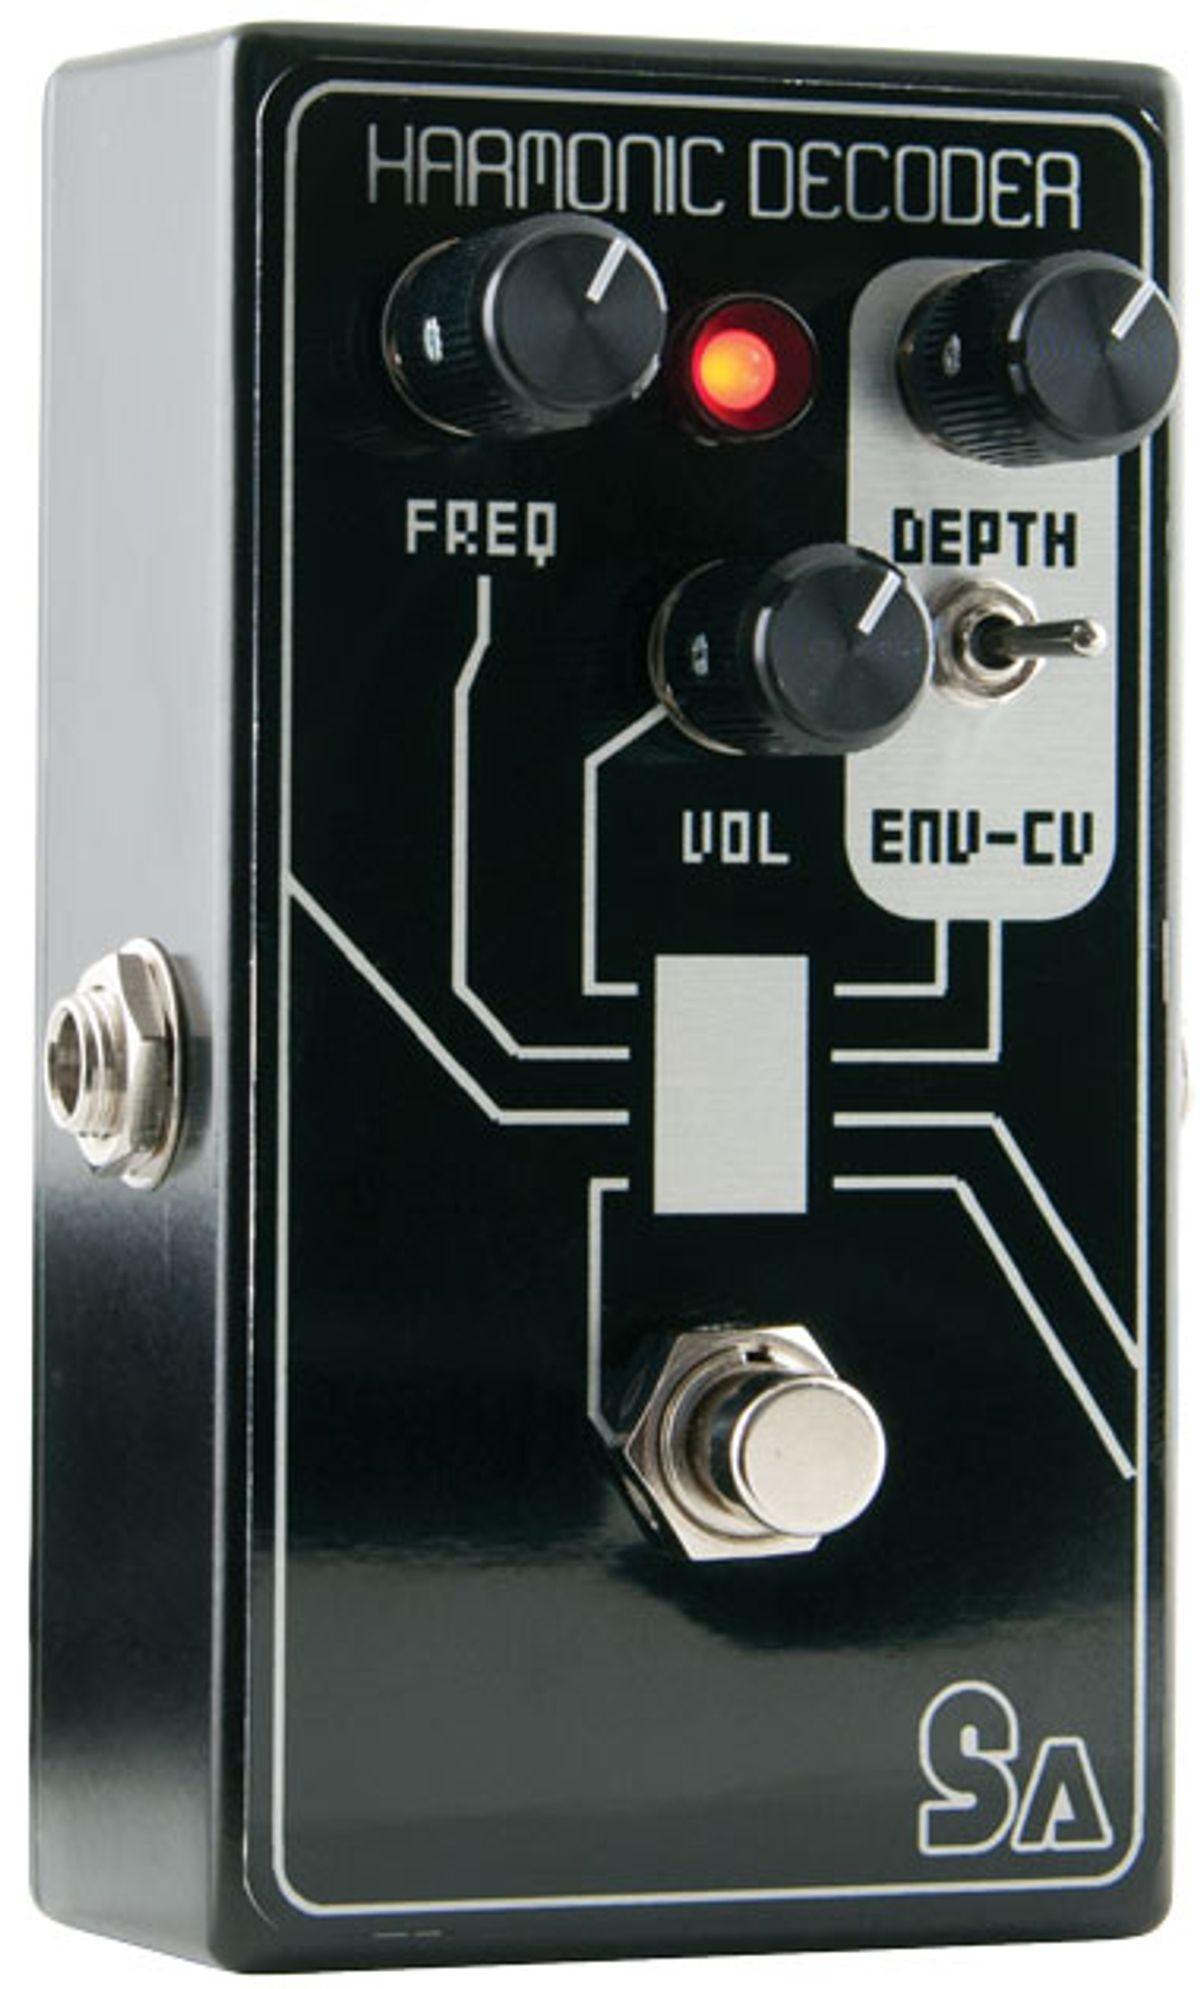 Sunsine Audio Harmonic Decoder Review